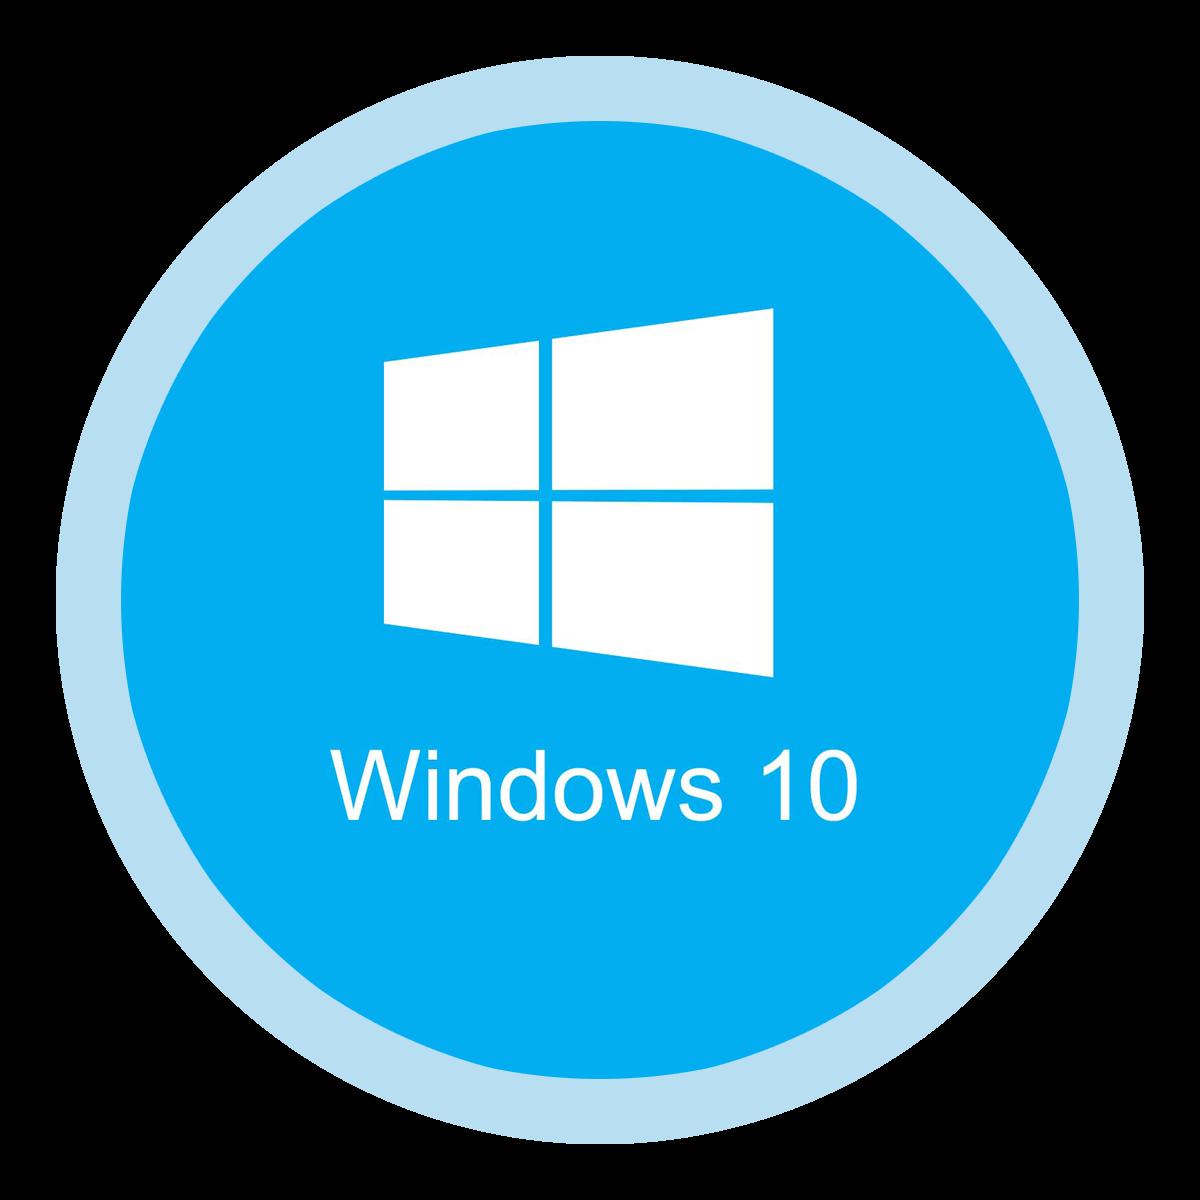 Microsoft Windows Logo Transparent Background Images